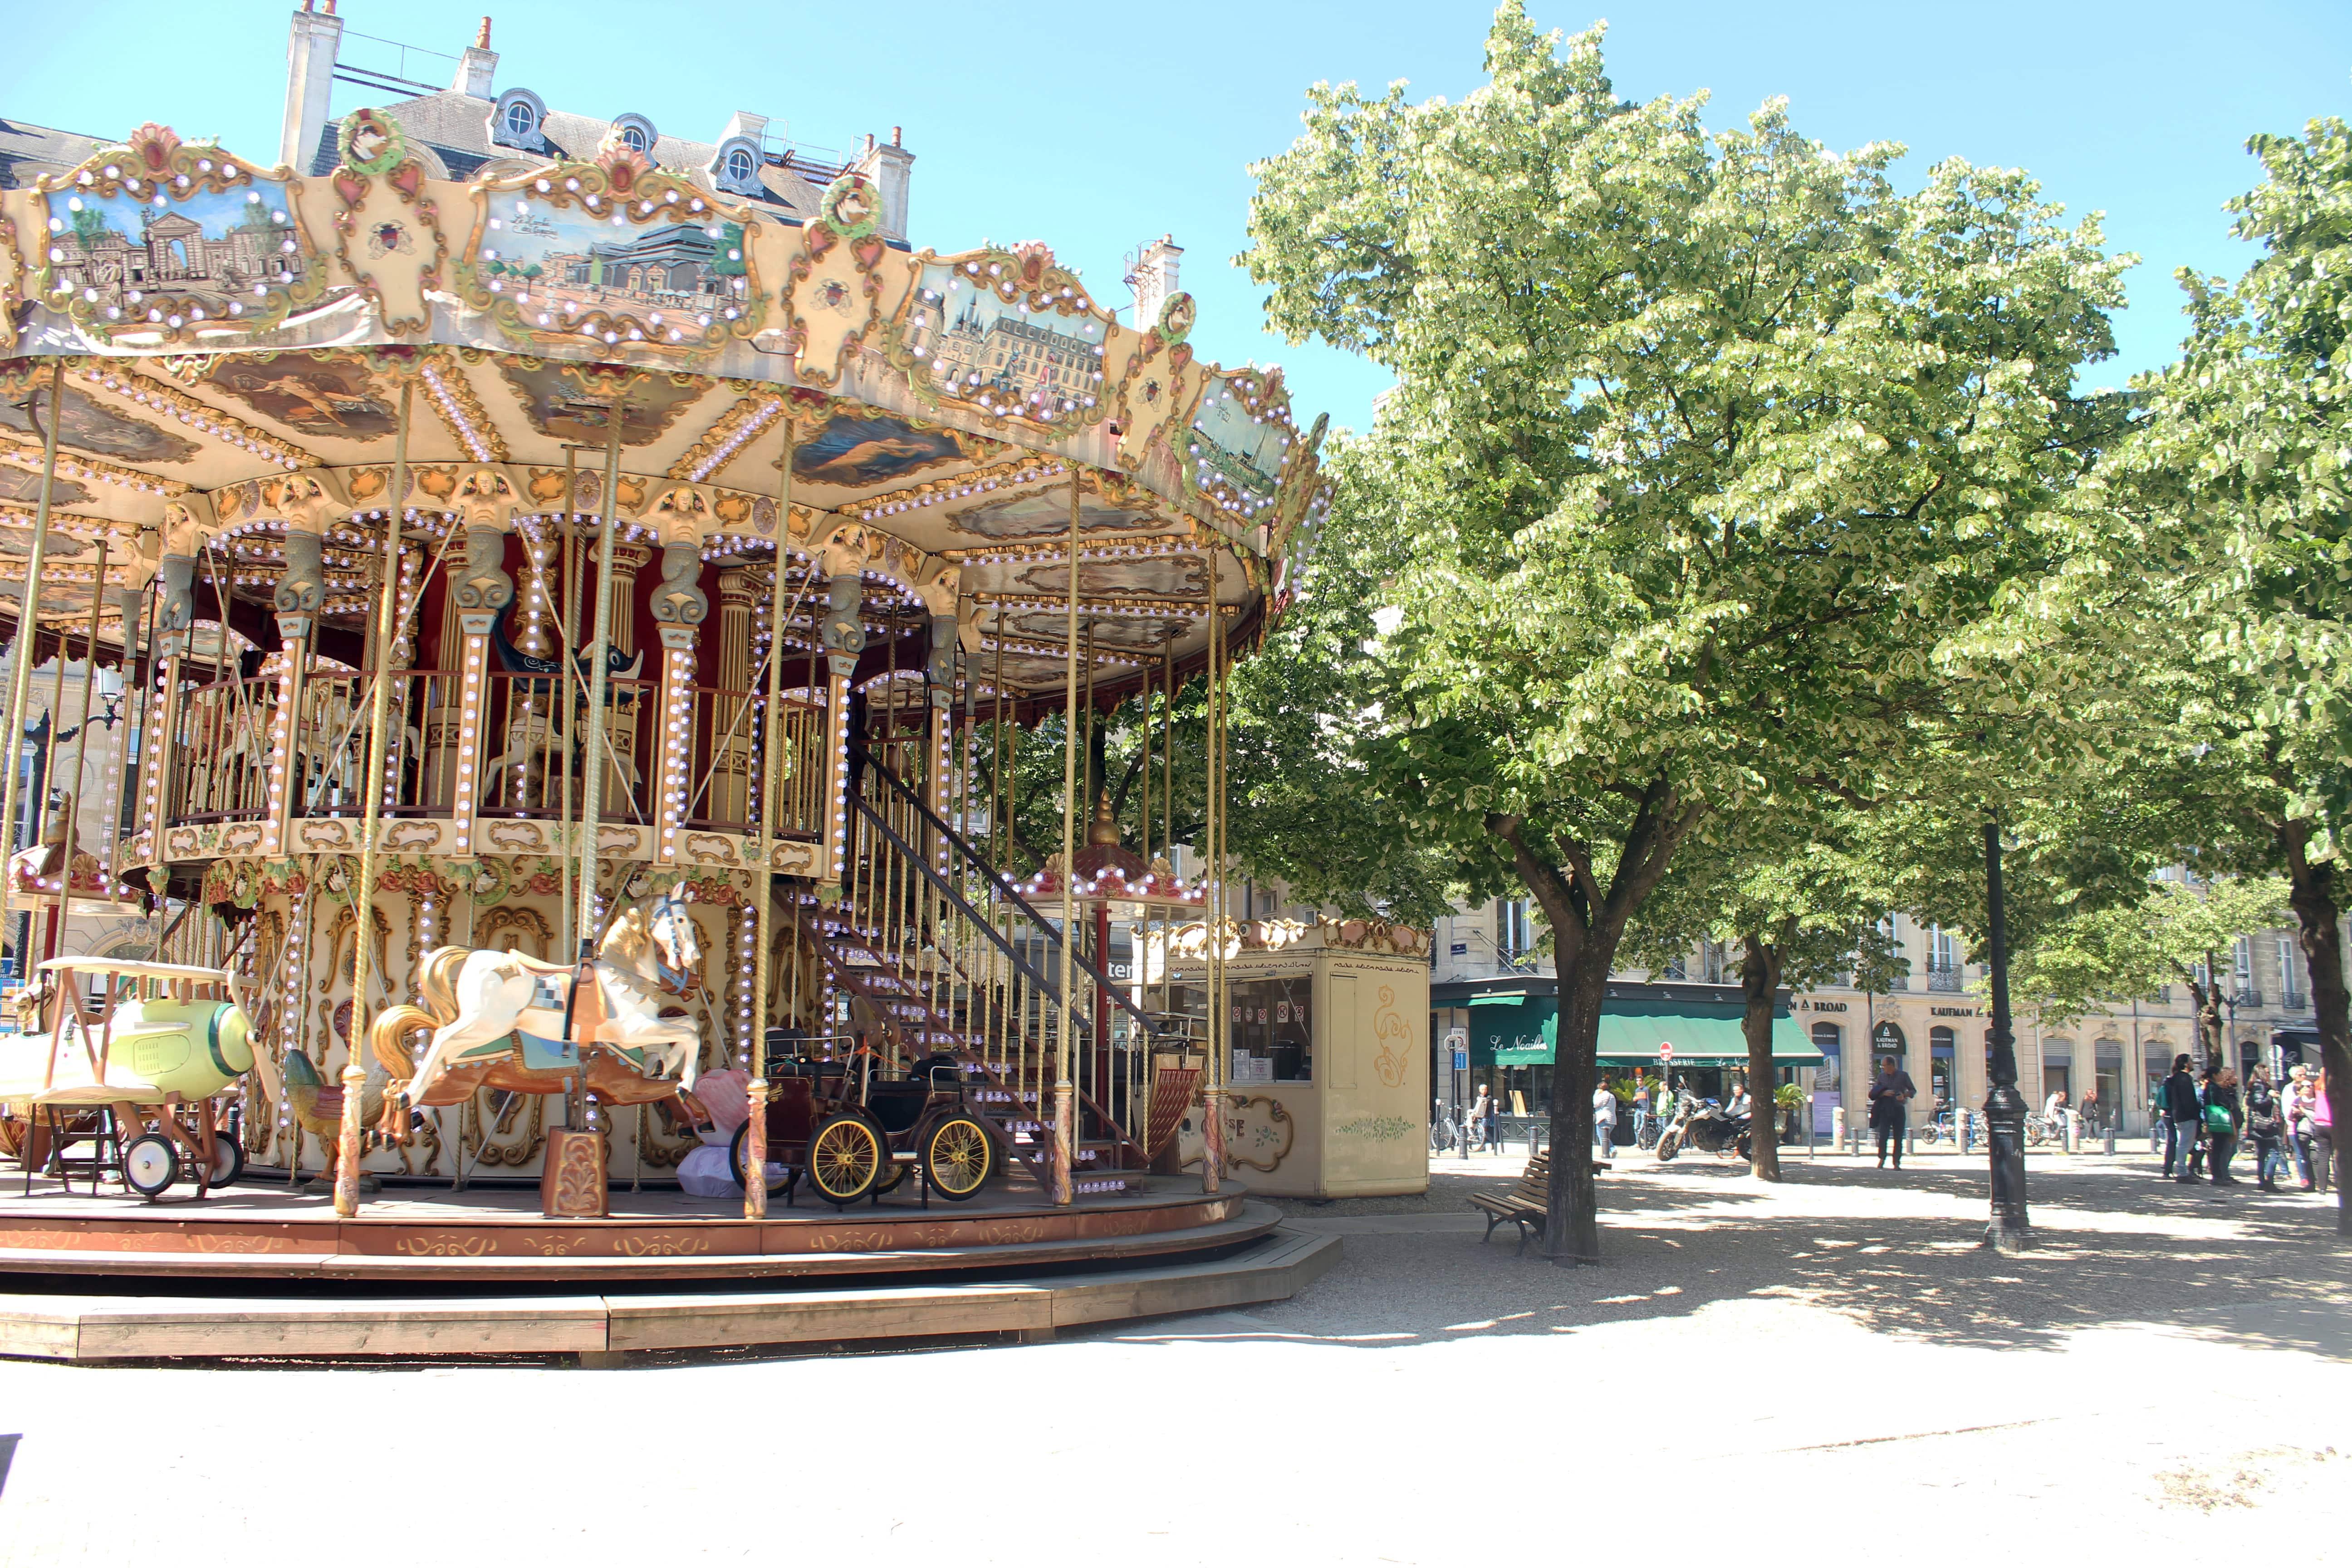 Carrousel Tourny